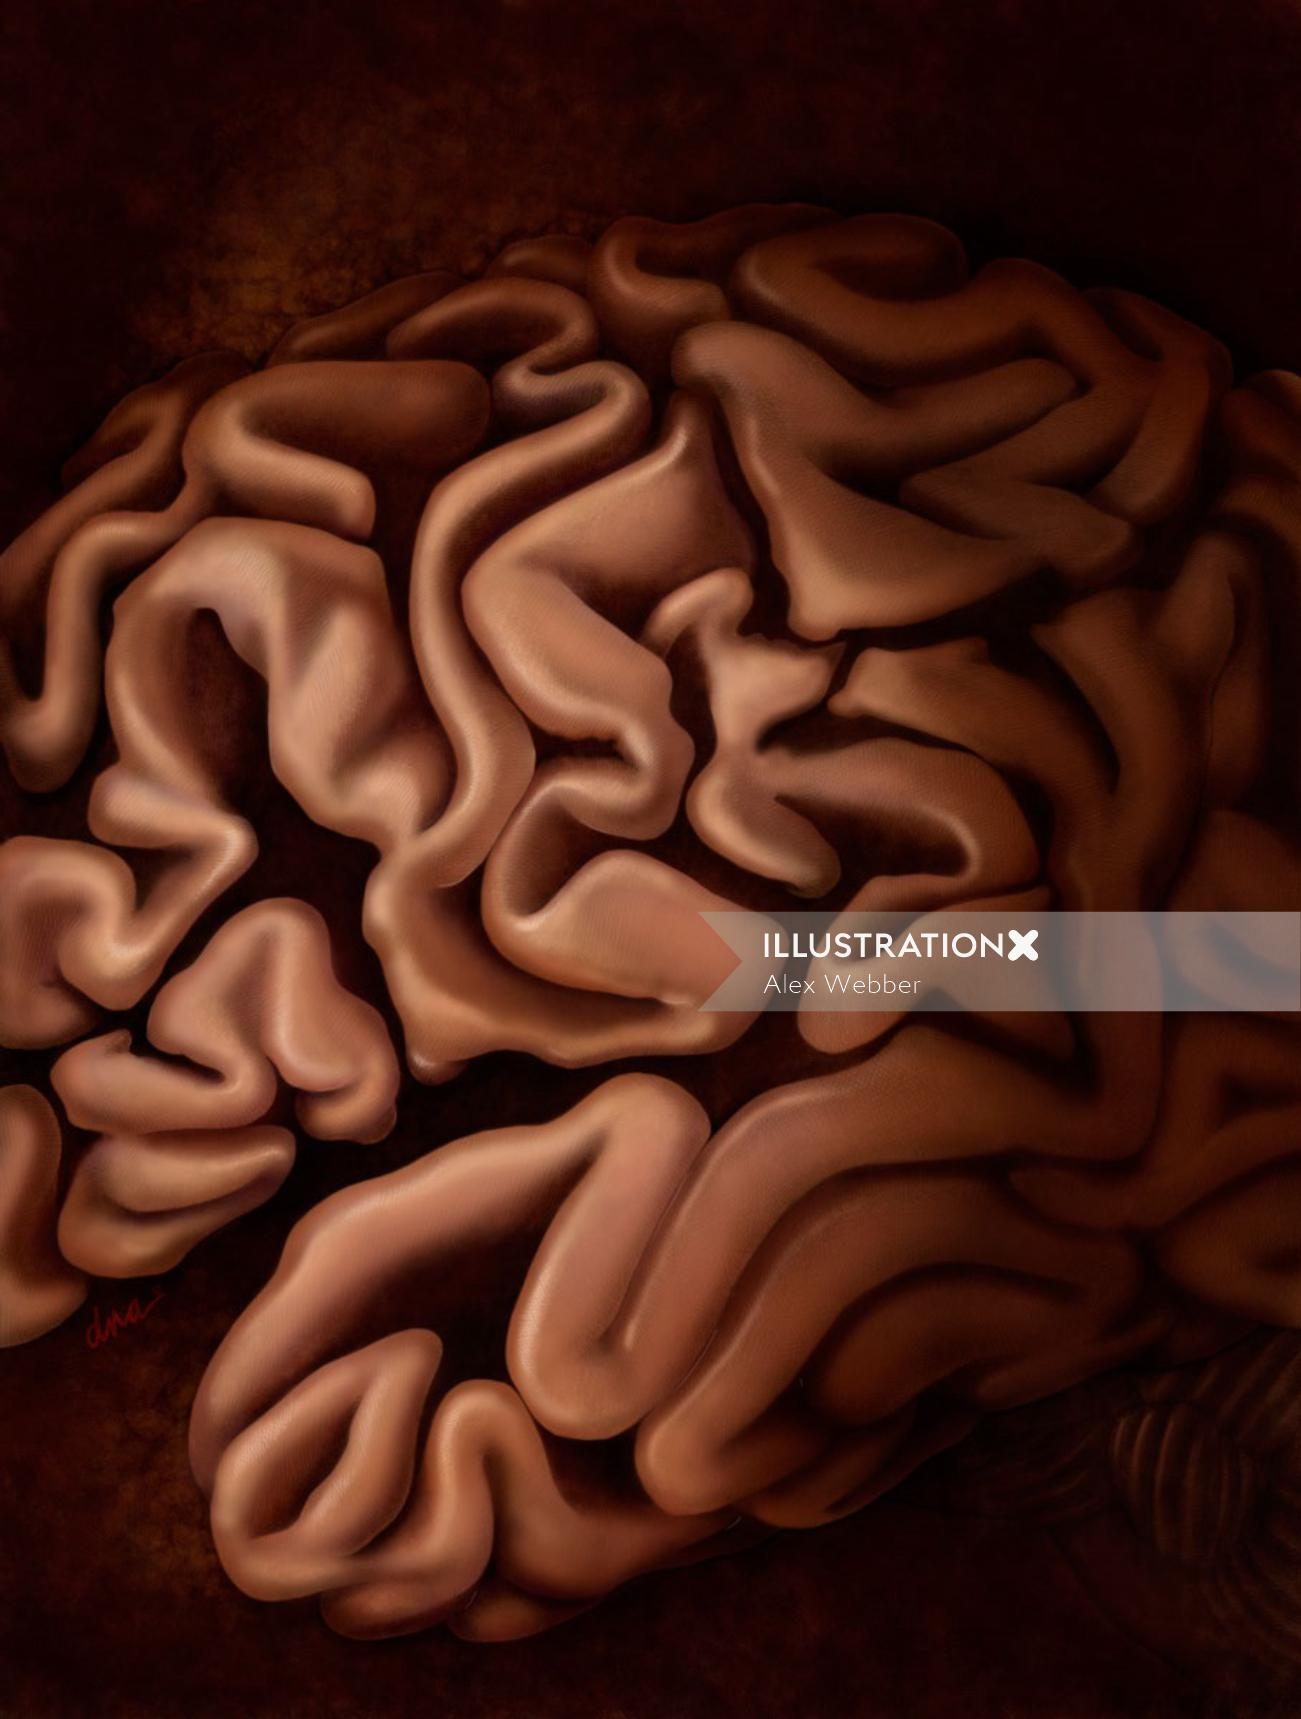 An illustration of cerebral cortex of the brain